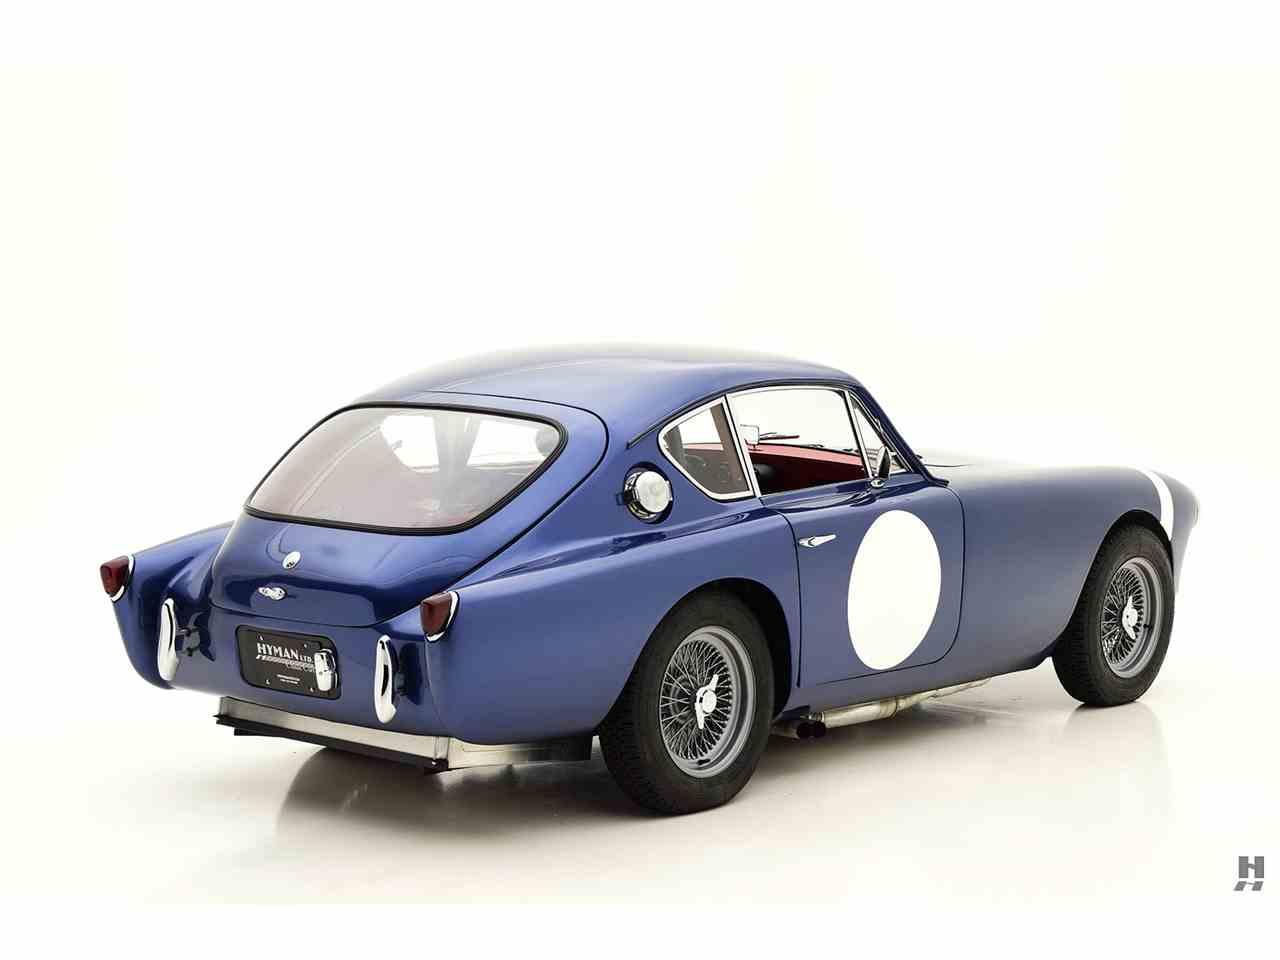 1959 AC Aceca for Sale   ClassicCars.com   CC-994184